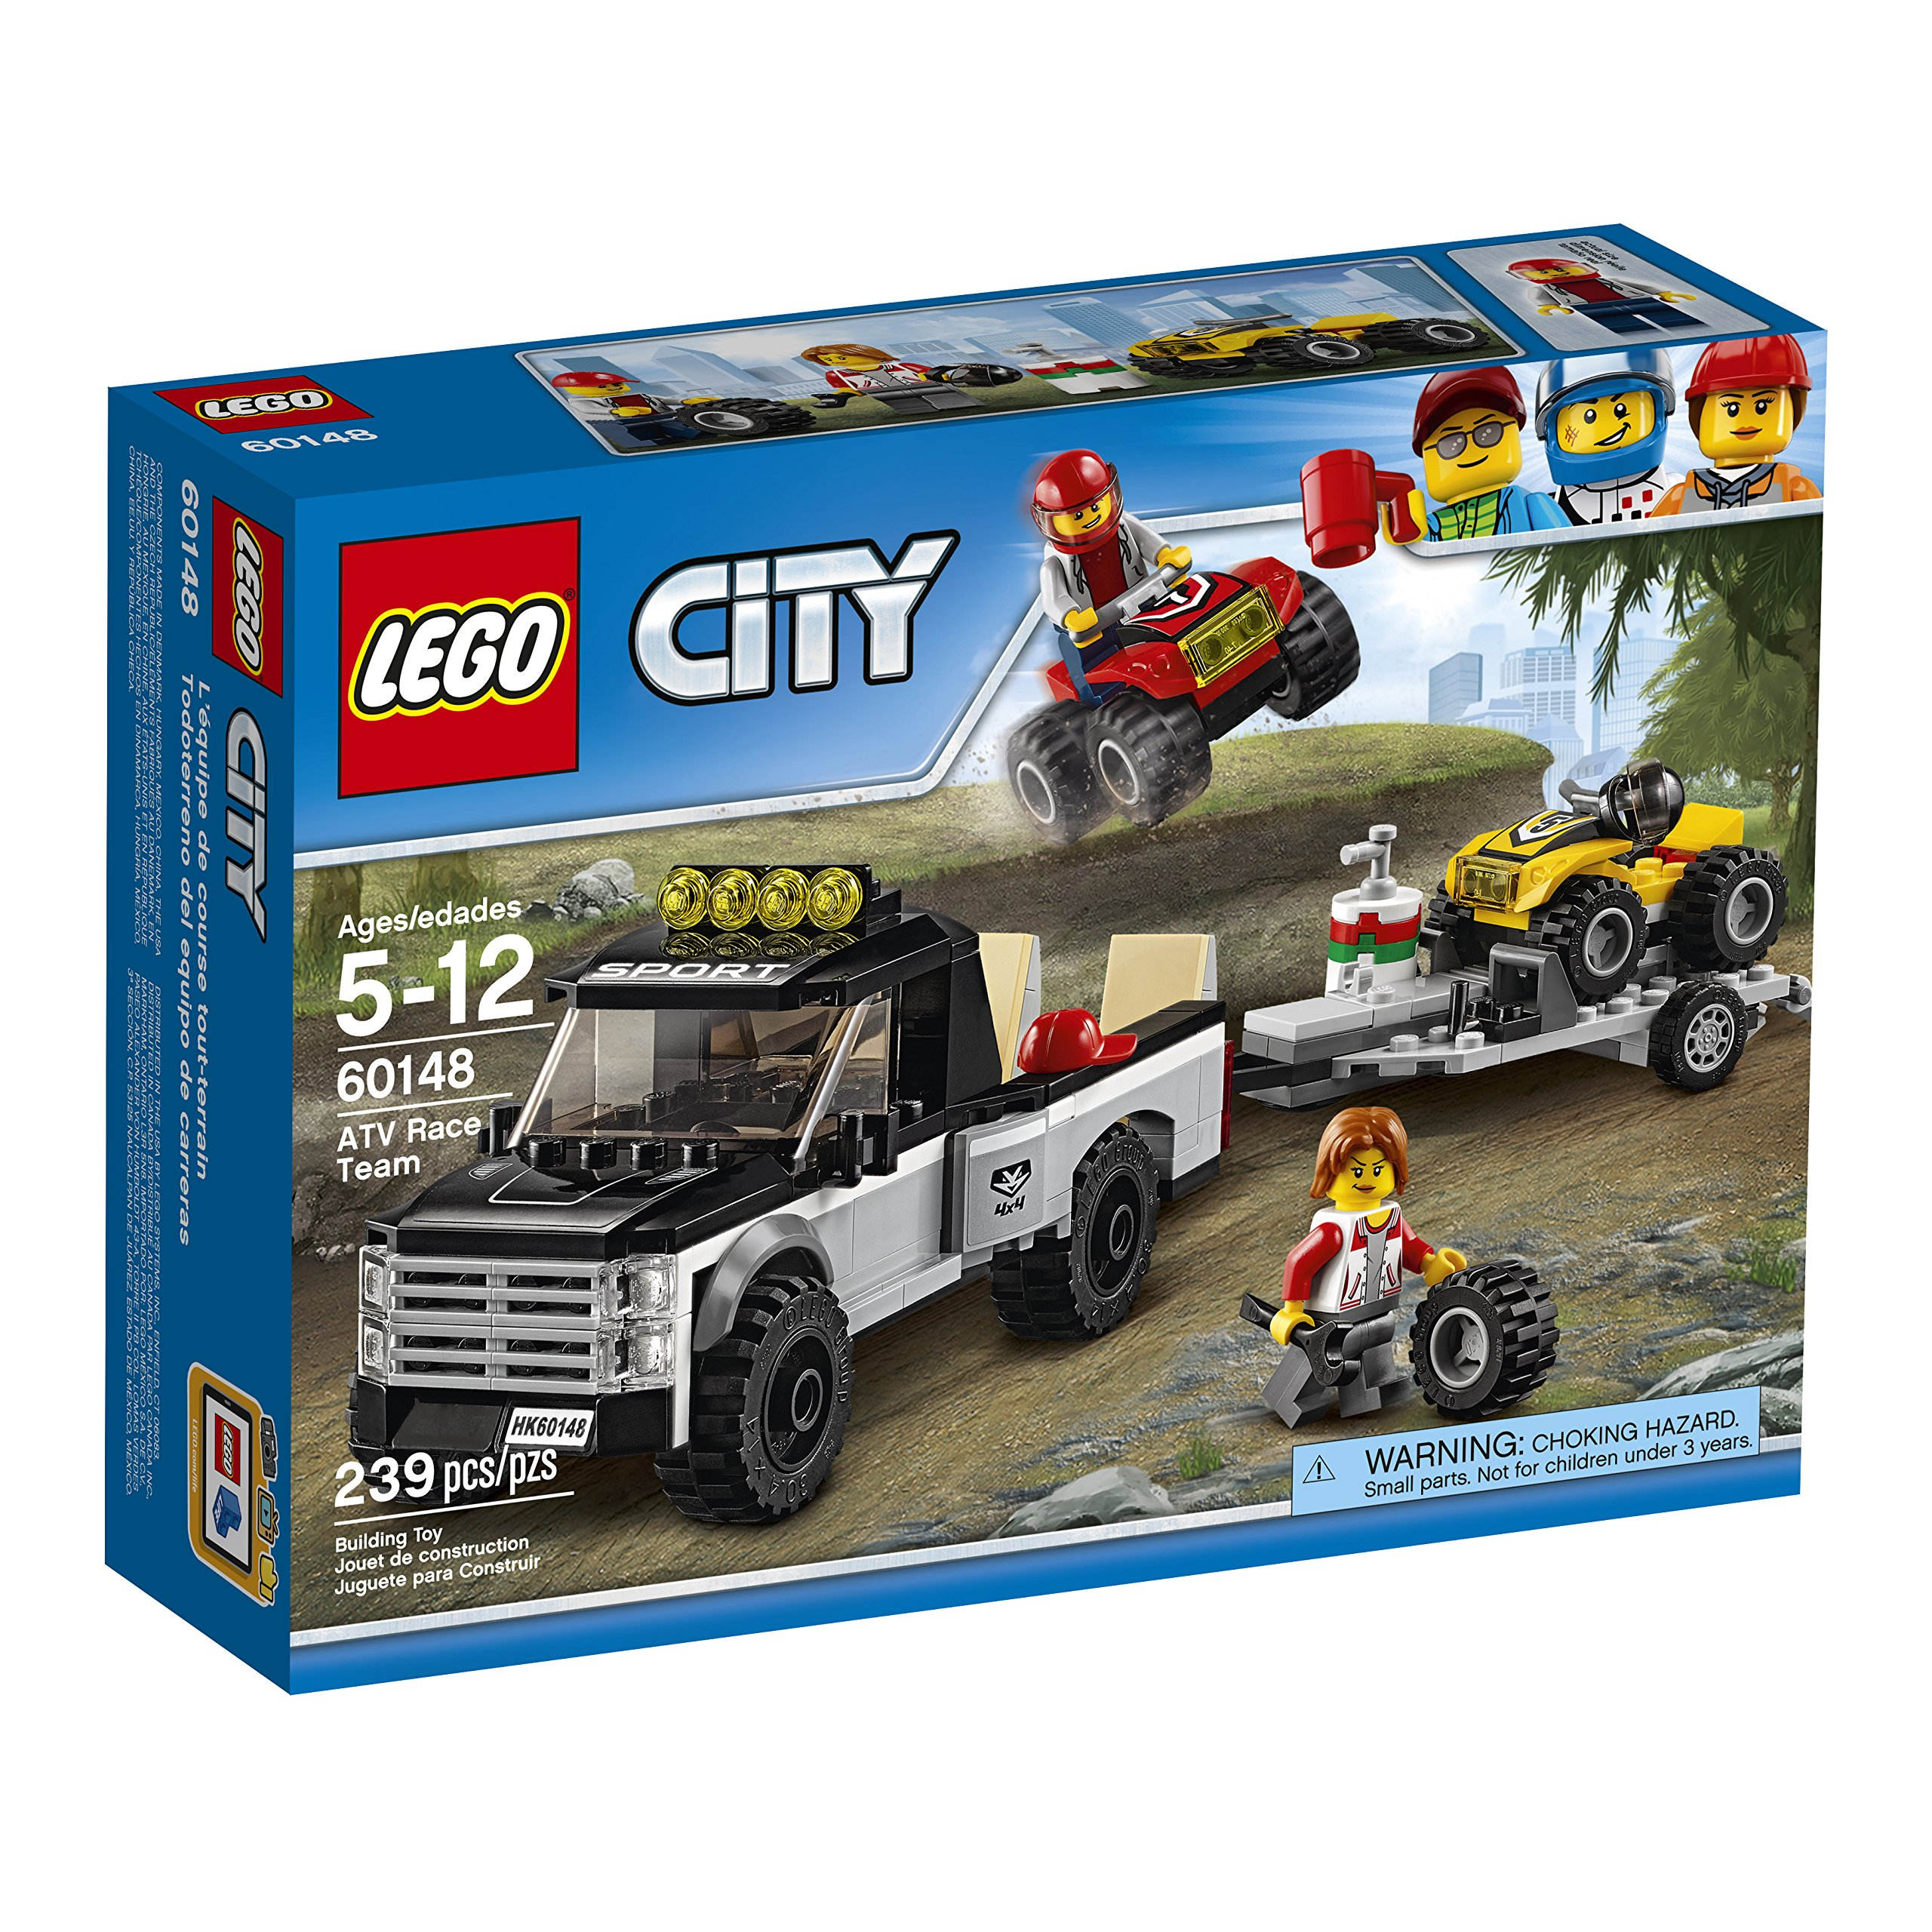 LEGO City ATV Race Team 60148 Best Toy